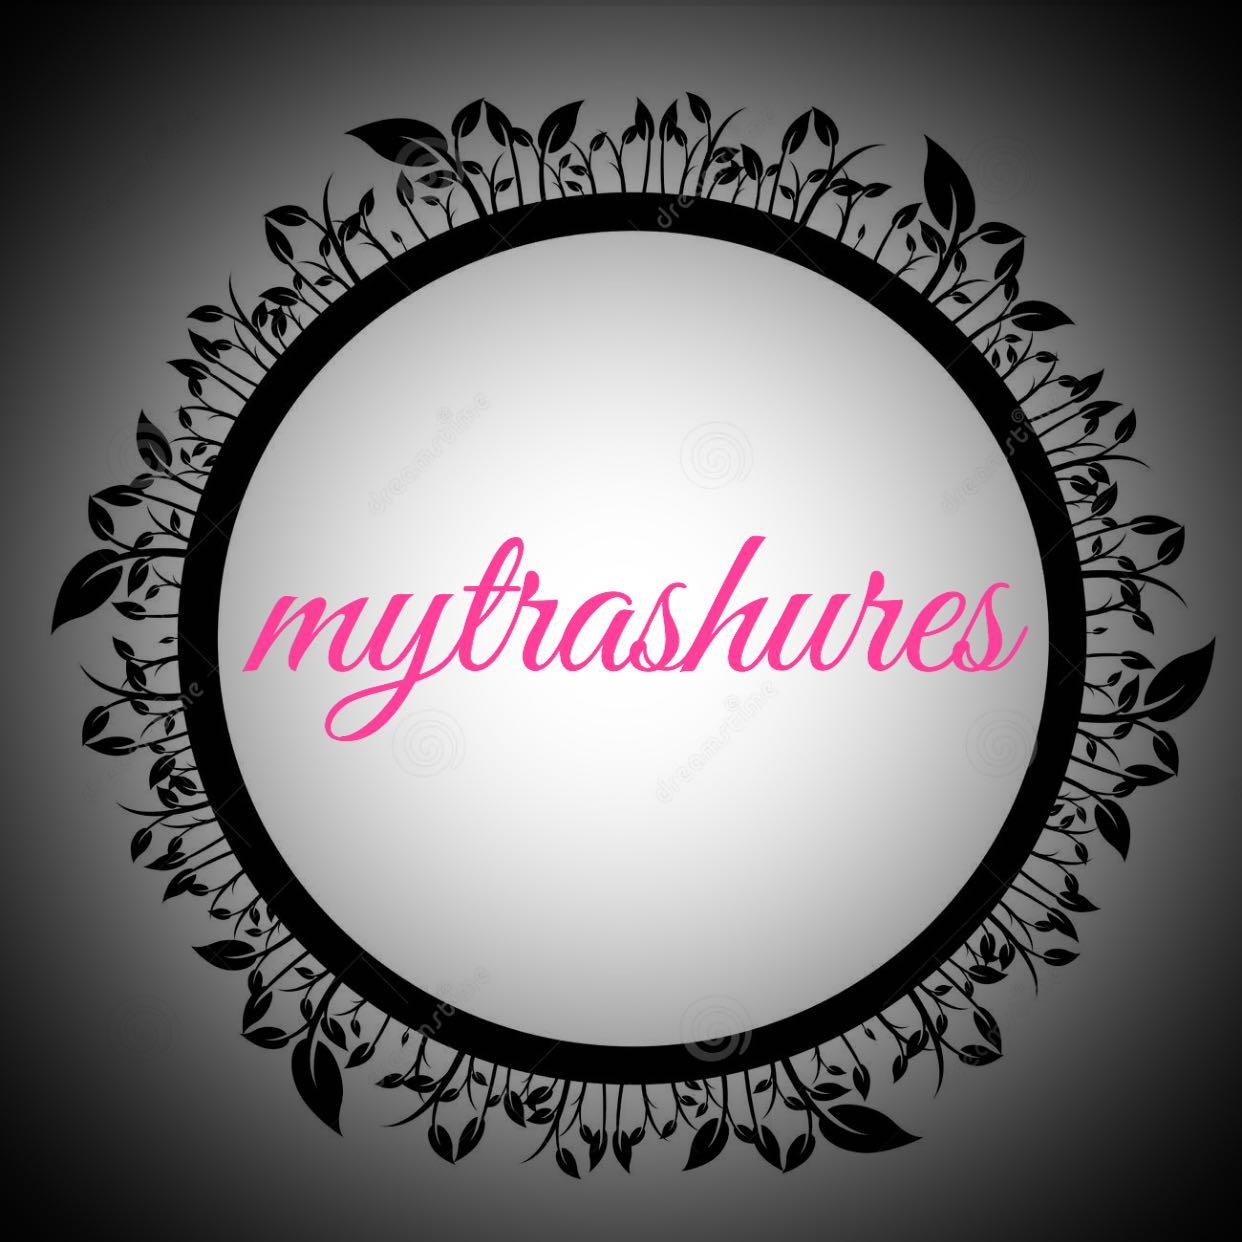 mytrashures